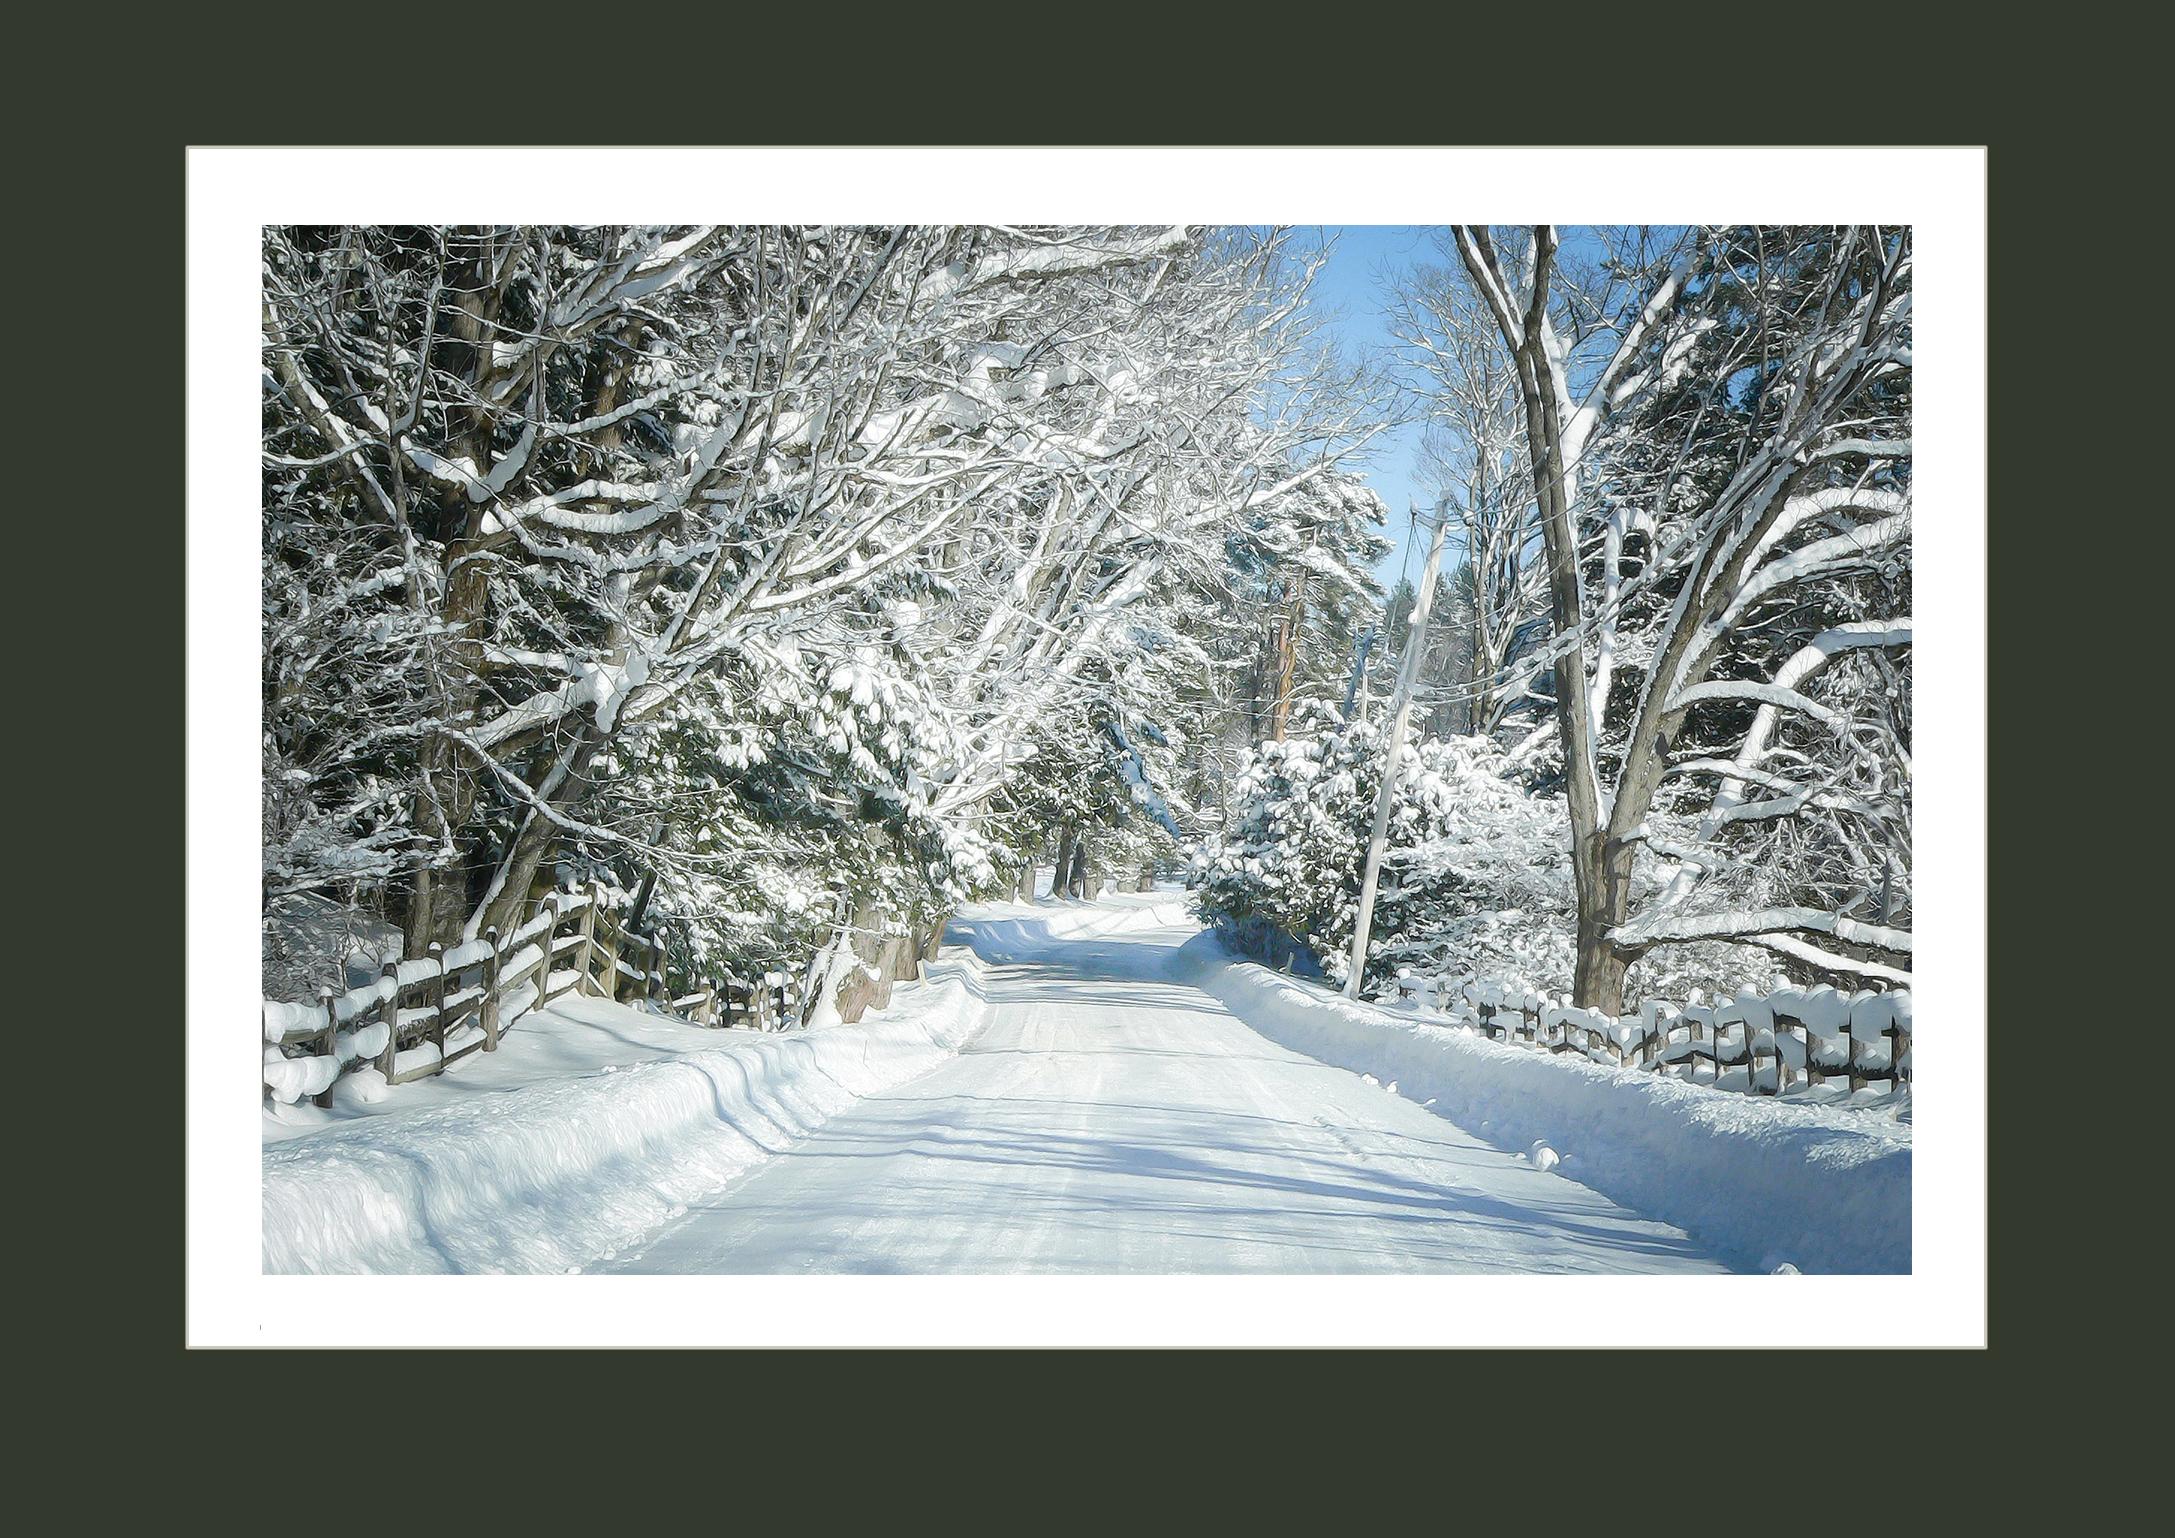 Partridge Hill Rd Winters Walk